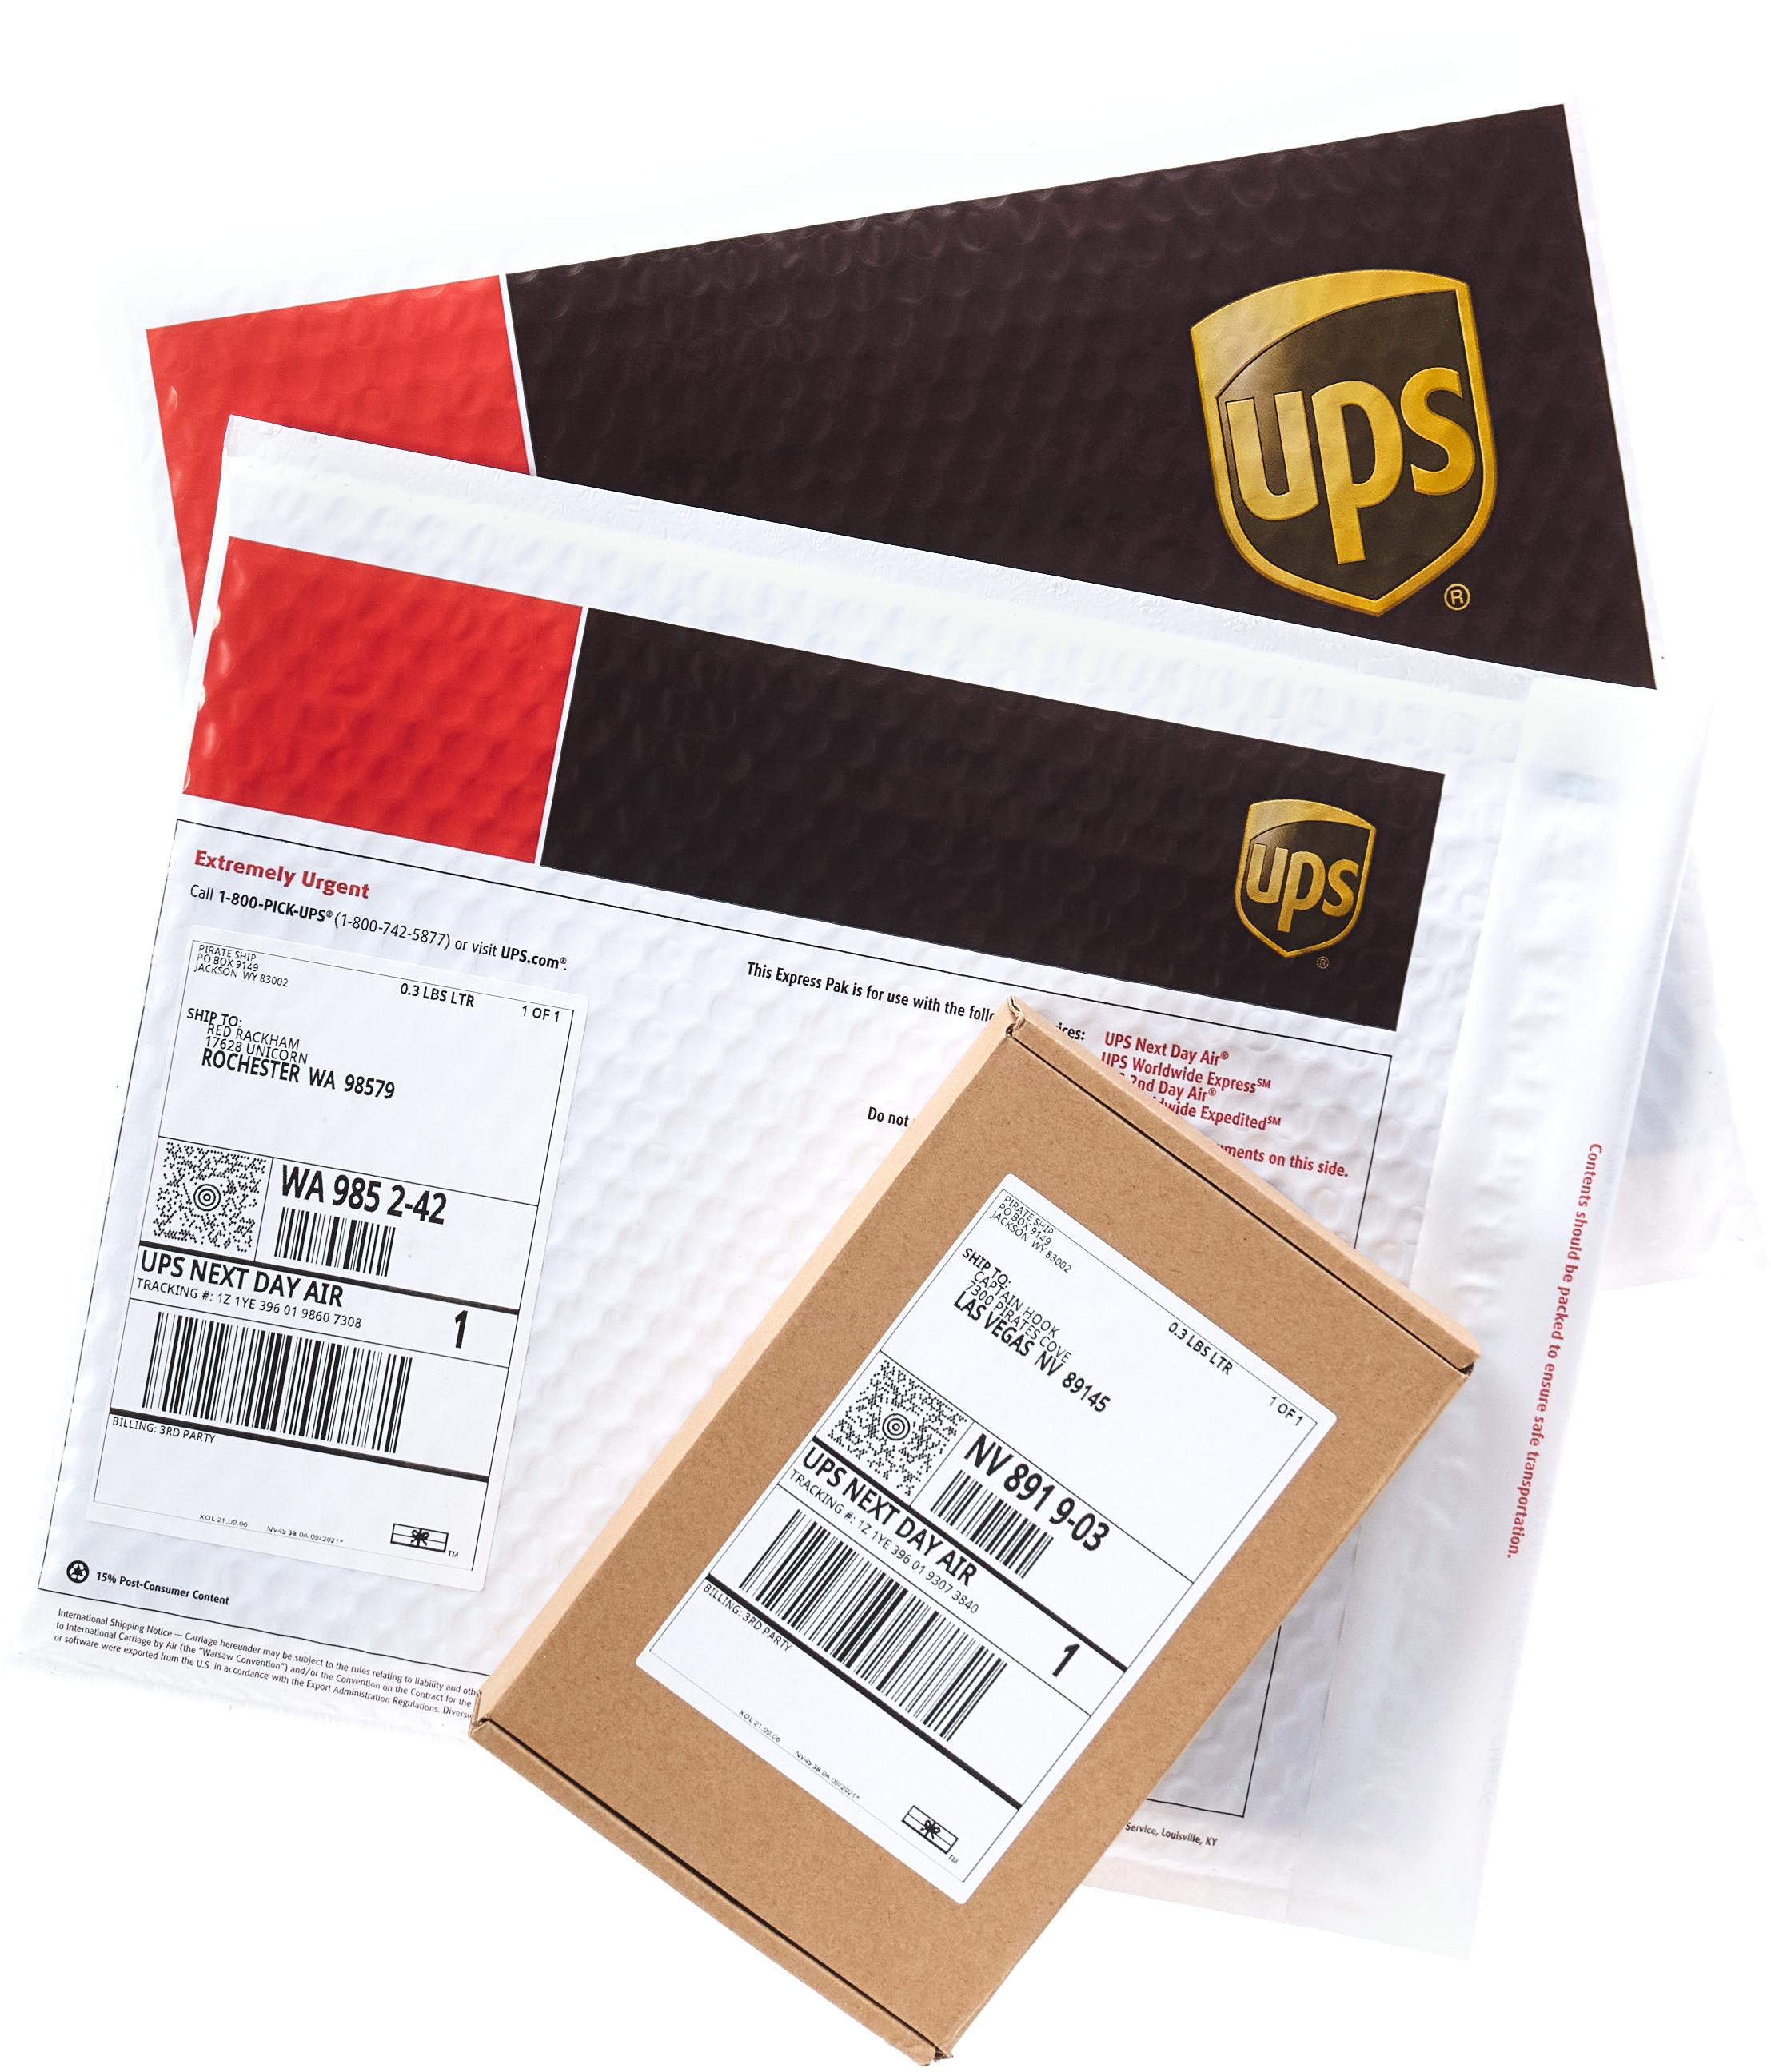 UPS Express Paks and Box